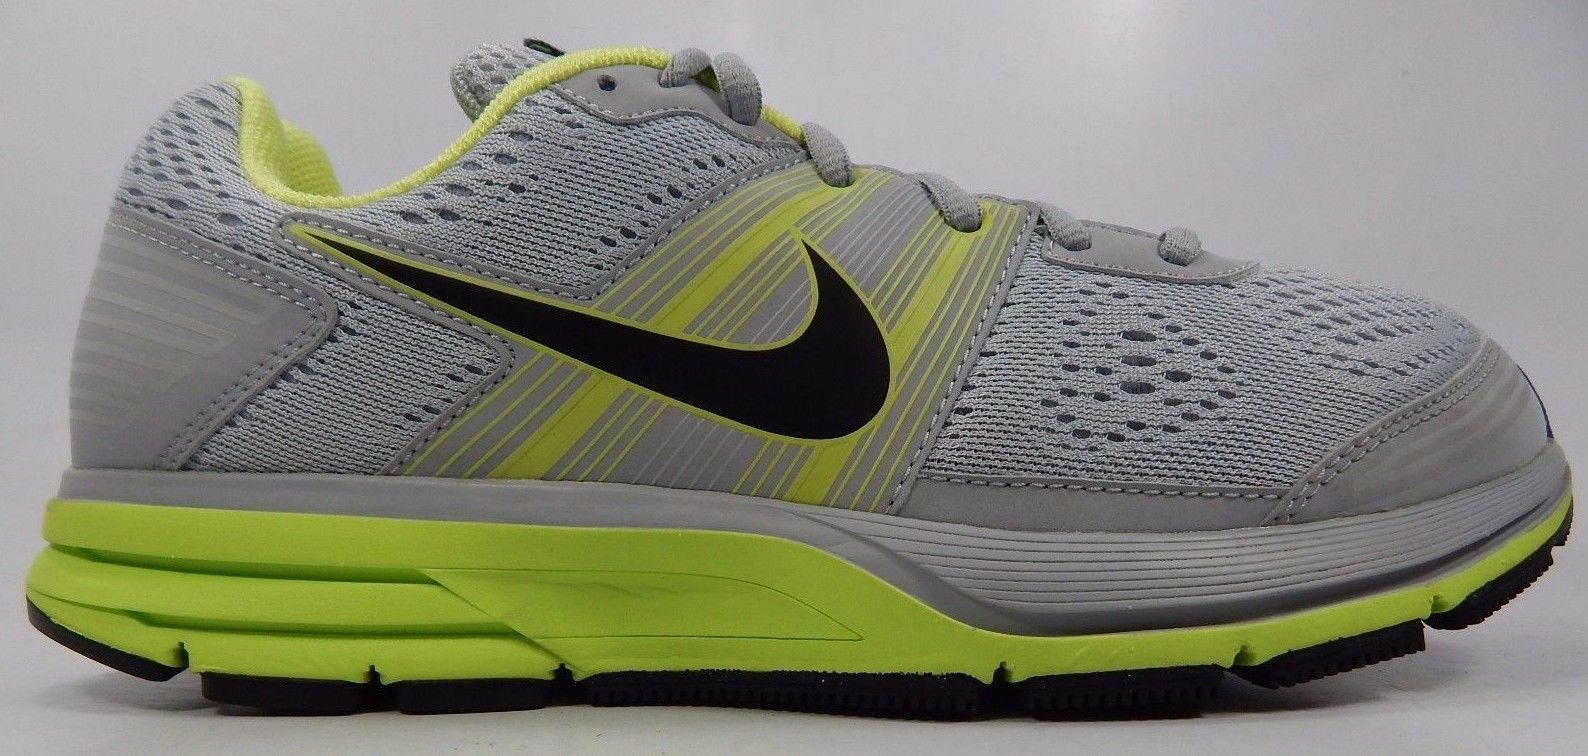 Nike Air Pegasus 29 Men's Running Shoes Size US 9 M (D) EU 42.5 Gray  524950-007